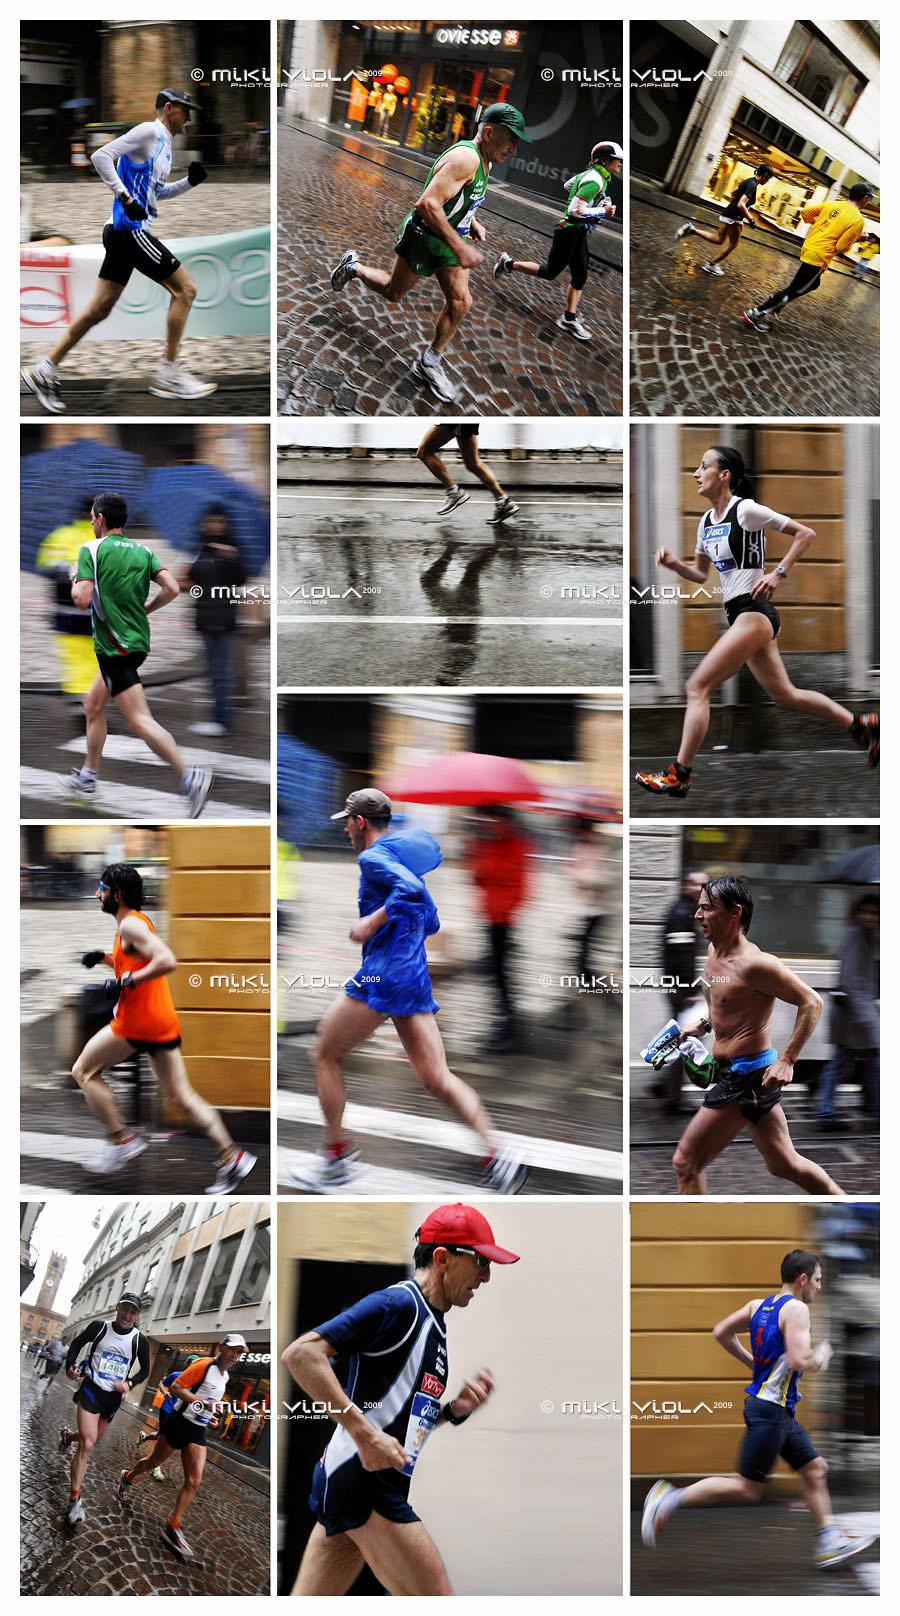 time-to-lose_miki-viola_treviso-marathon-2009-0011